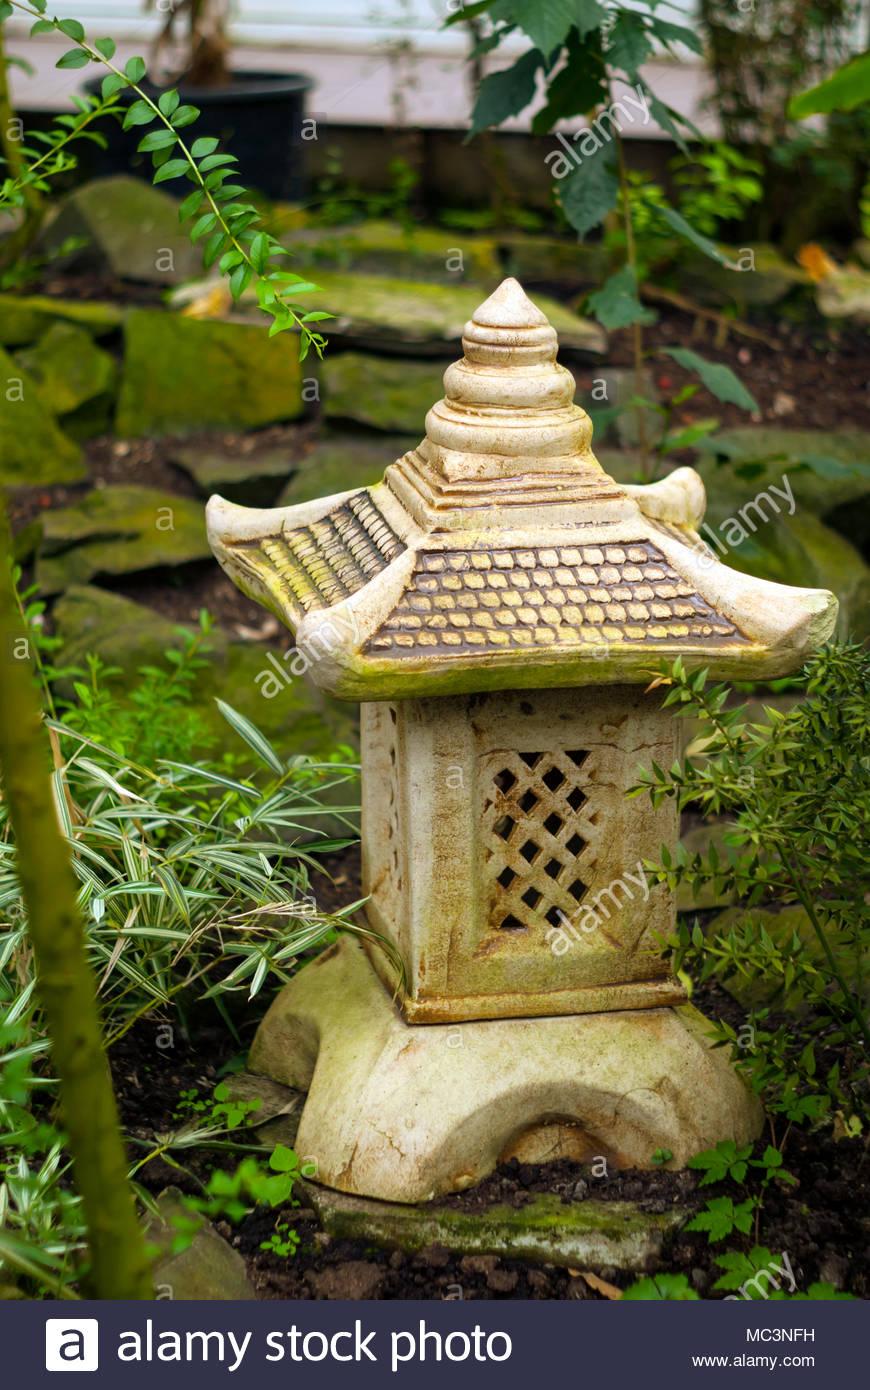 decorative garden lantern toro in Japanese style on the background 870x1390